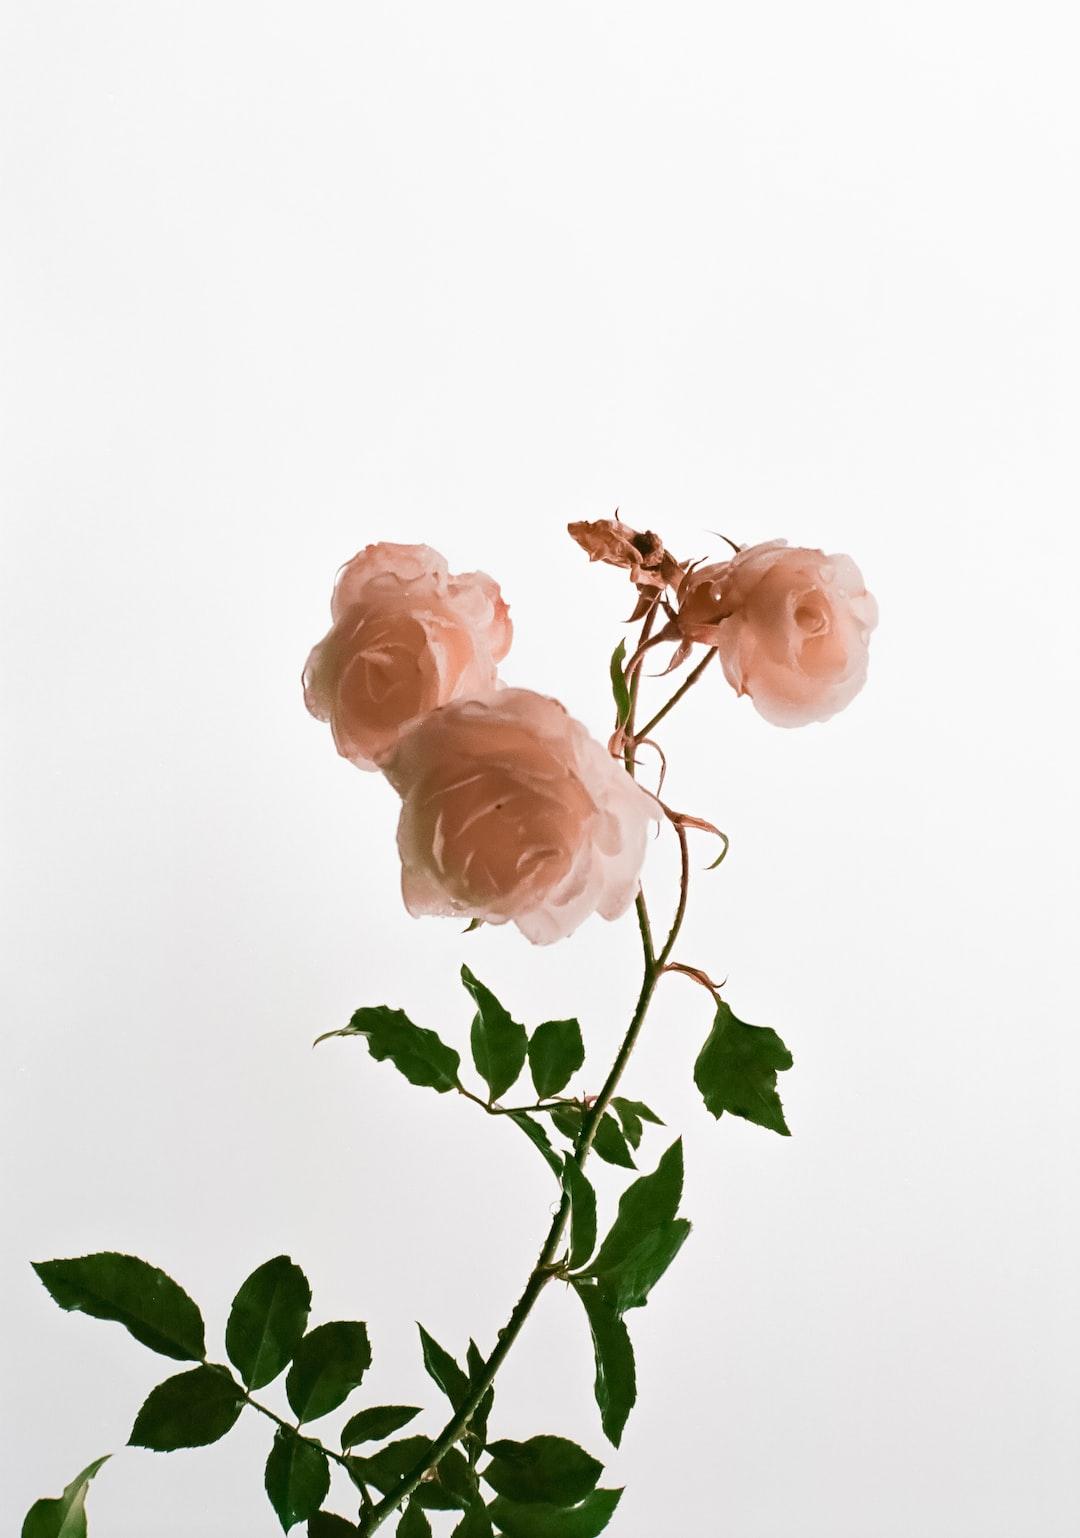 Flowers after a rainstorm. On Ektar 100.